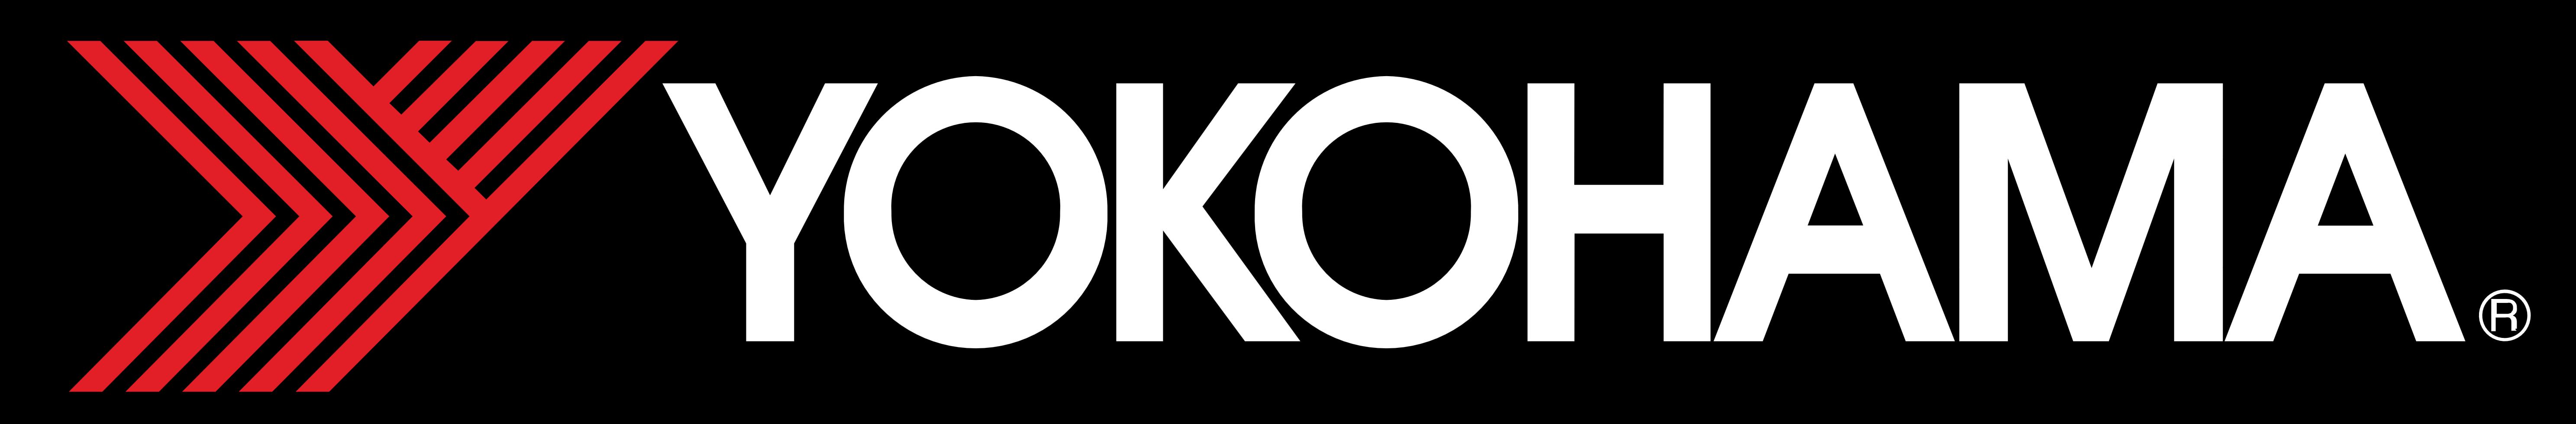 yokohama tyre logo